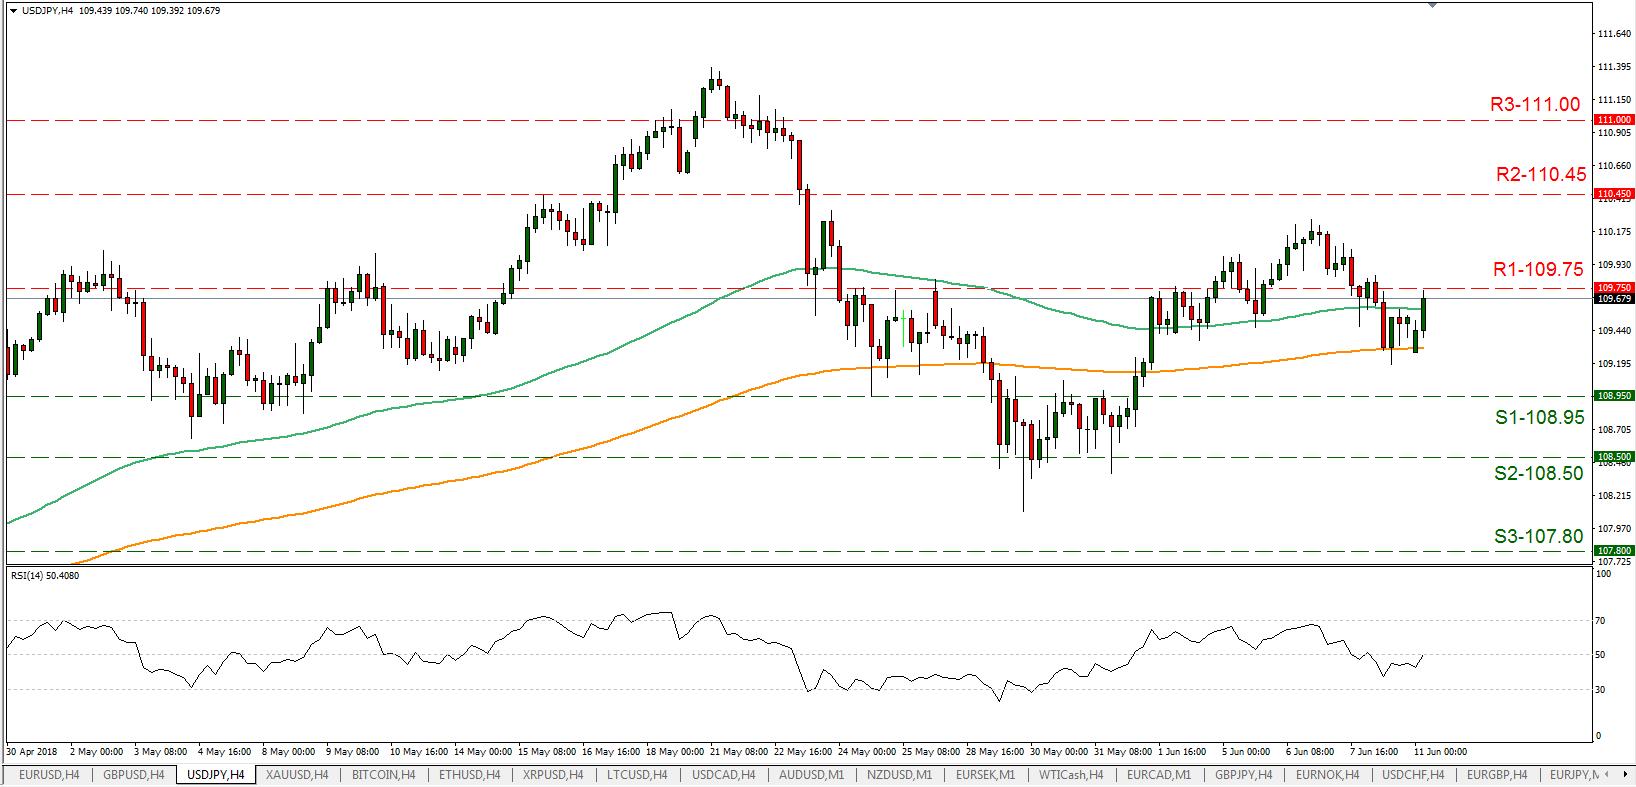 USD/JPY 11/06/2018 | EconAlerts